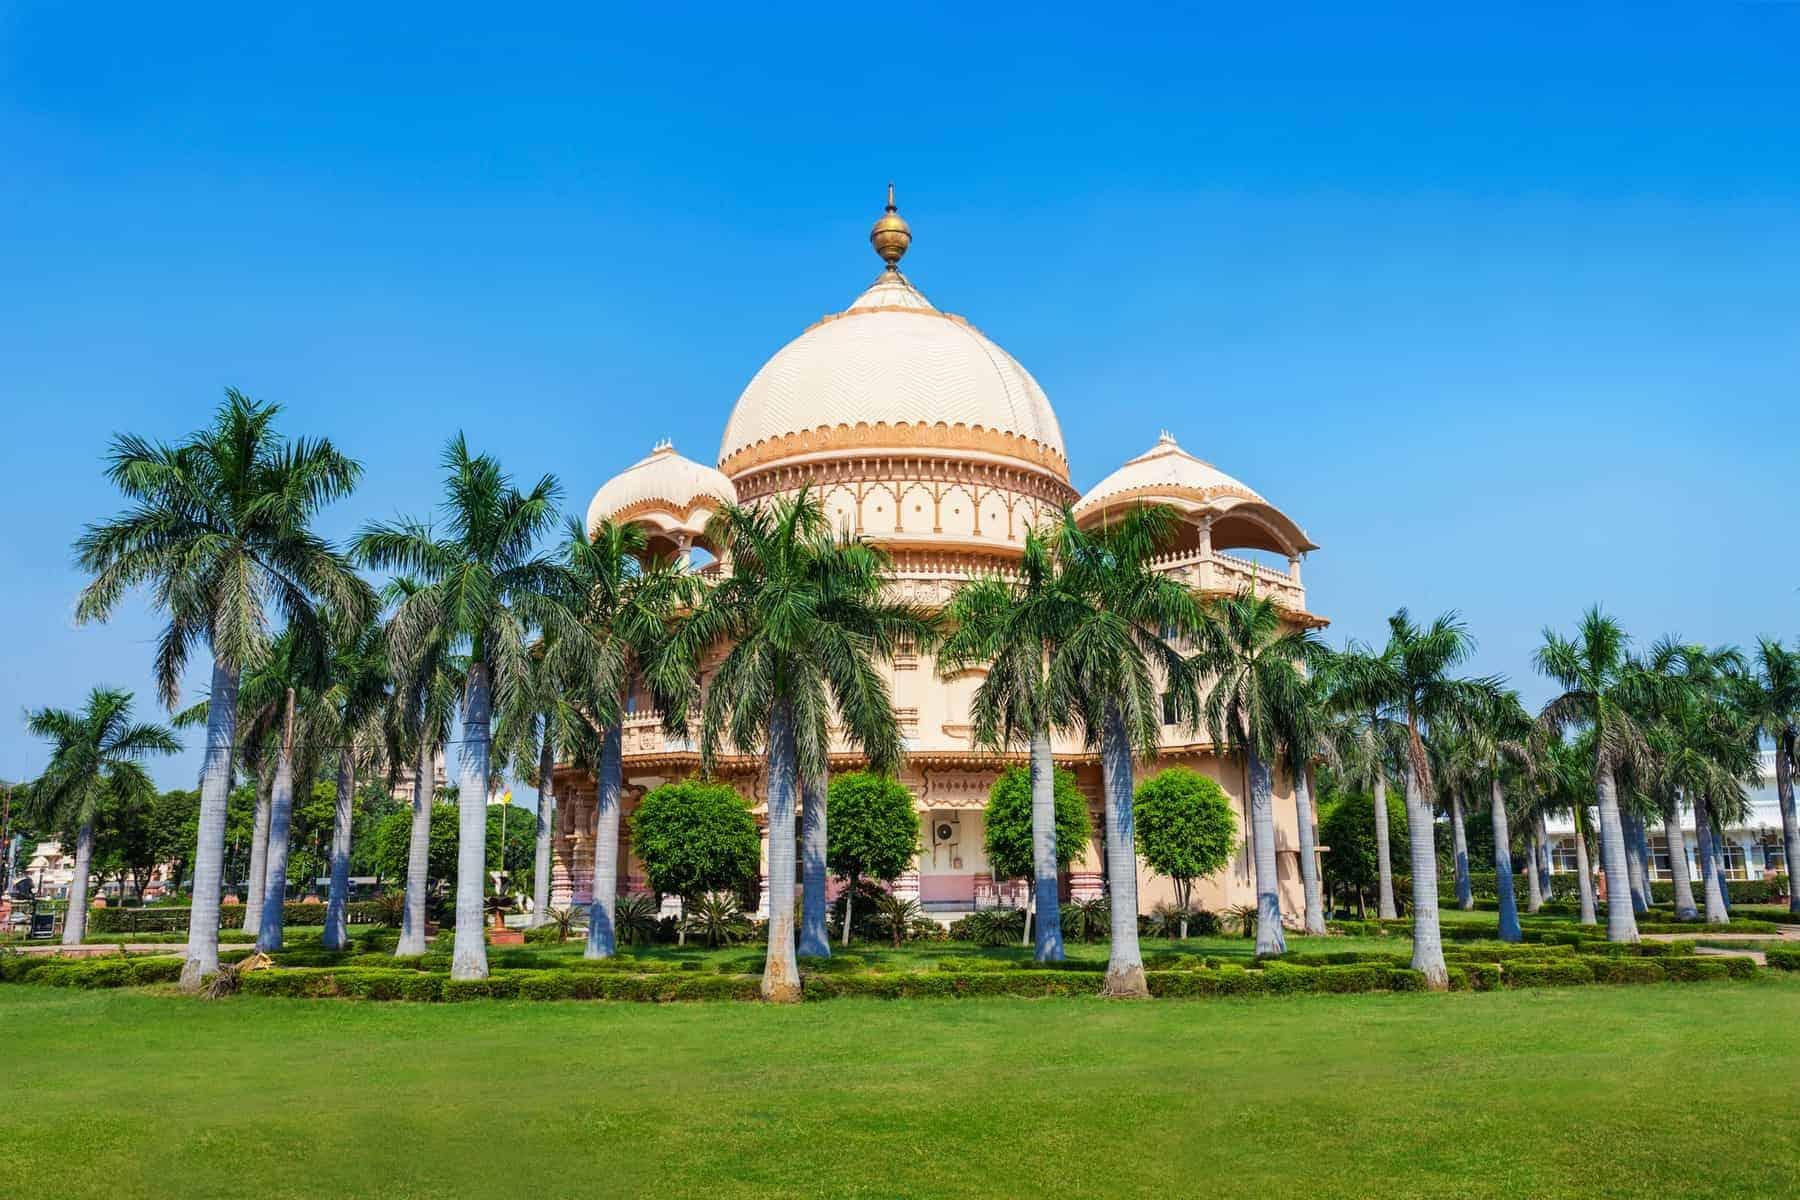 Shri Adhya Katyani Shakti Peeth Mandir is popularly known as Chhatarpur Temple